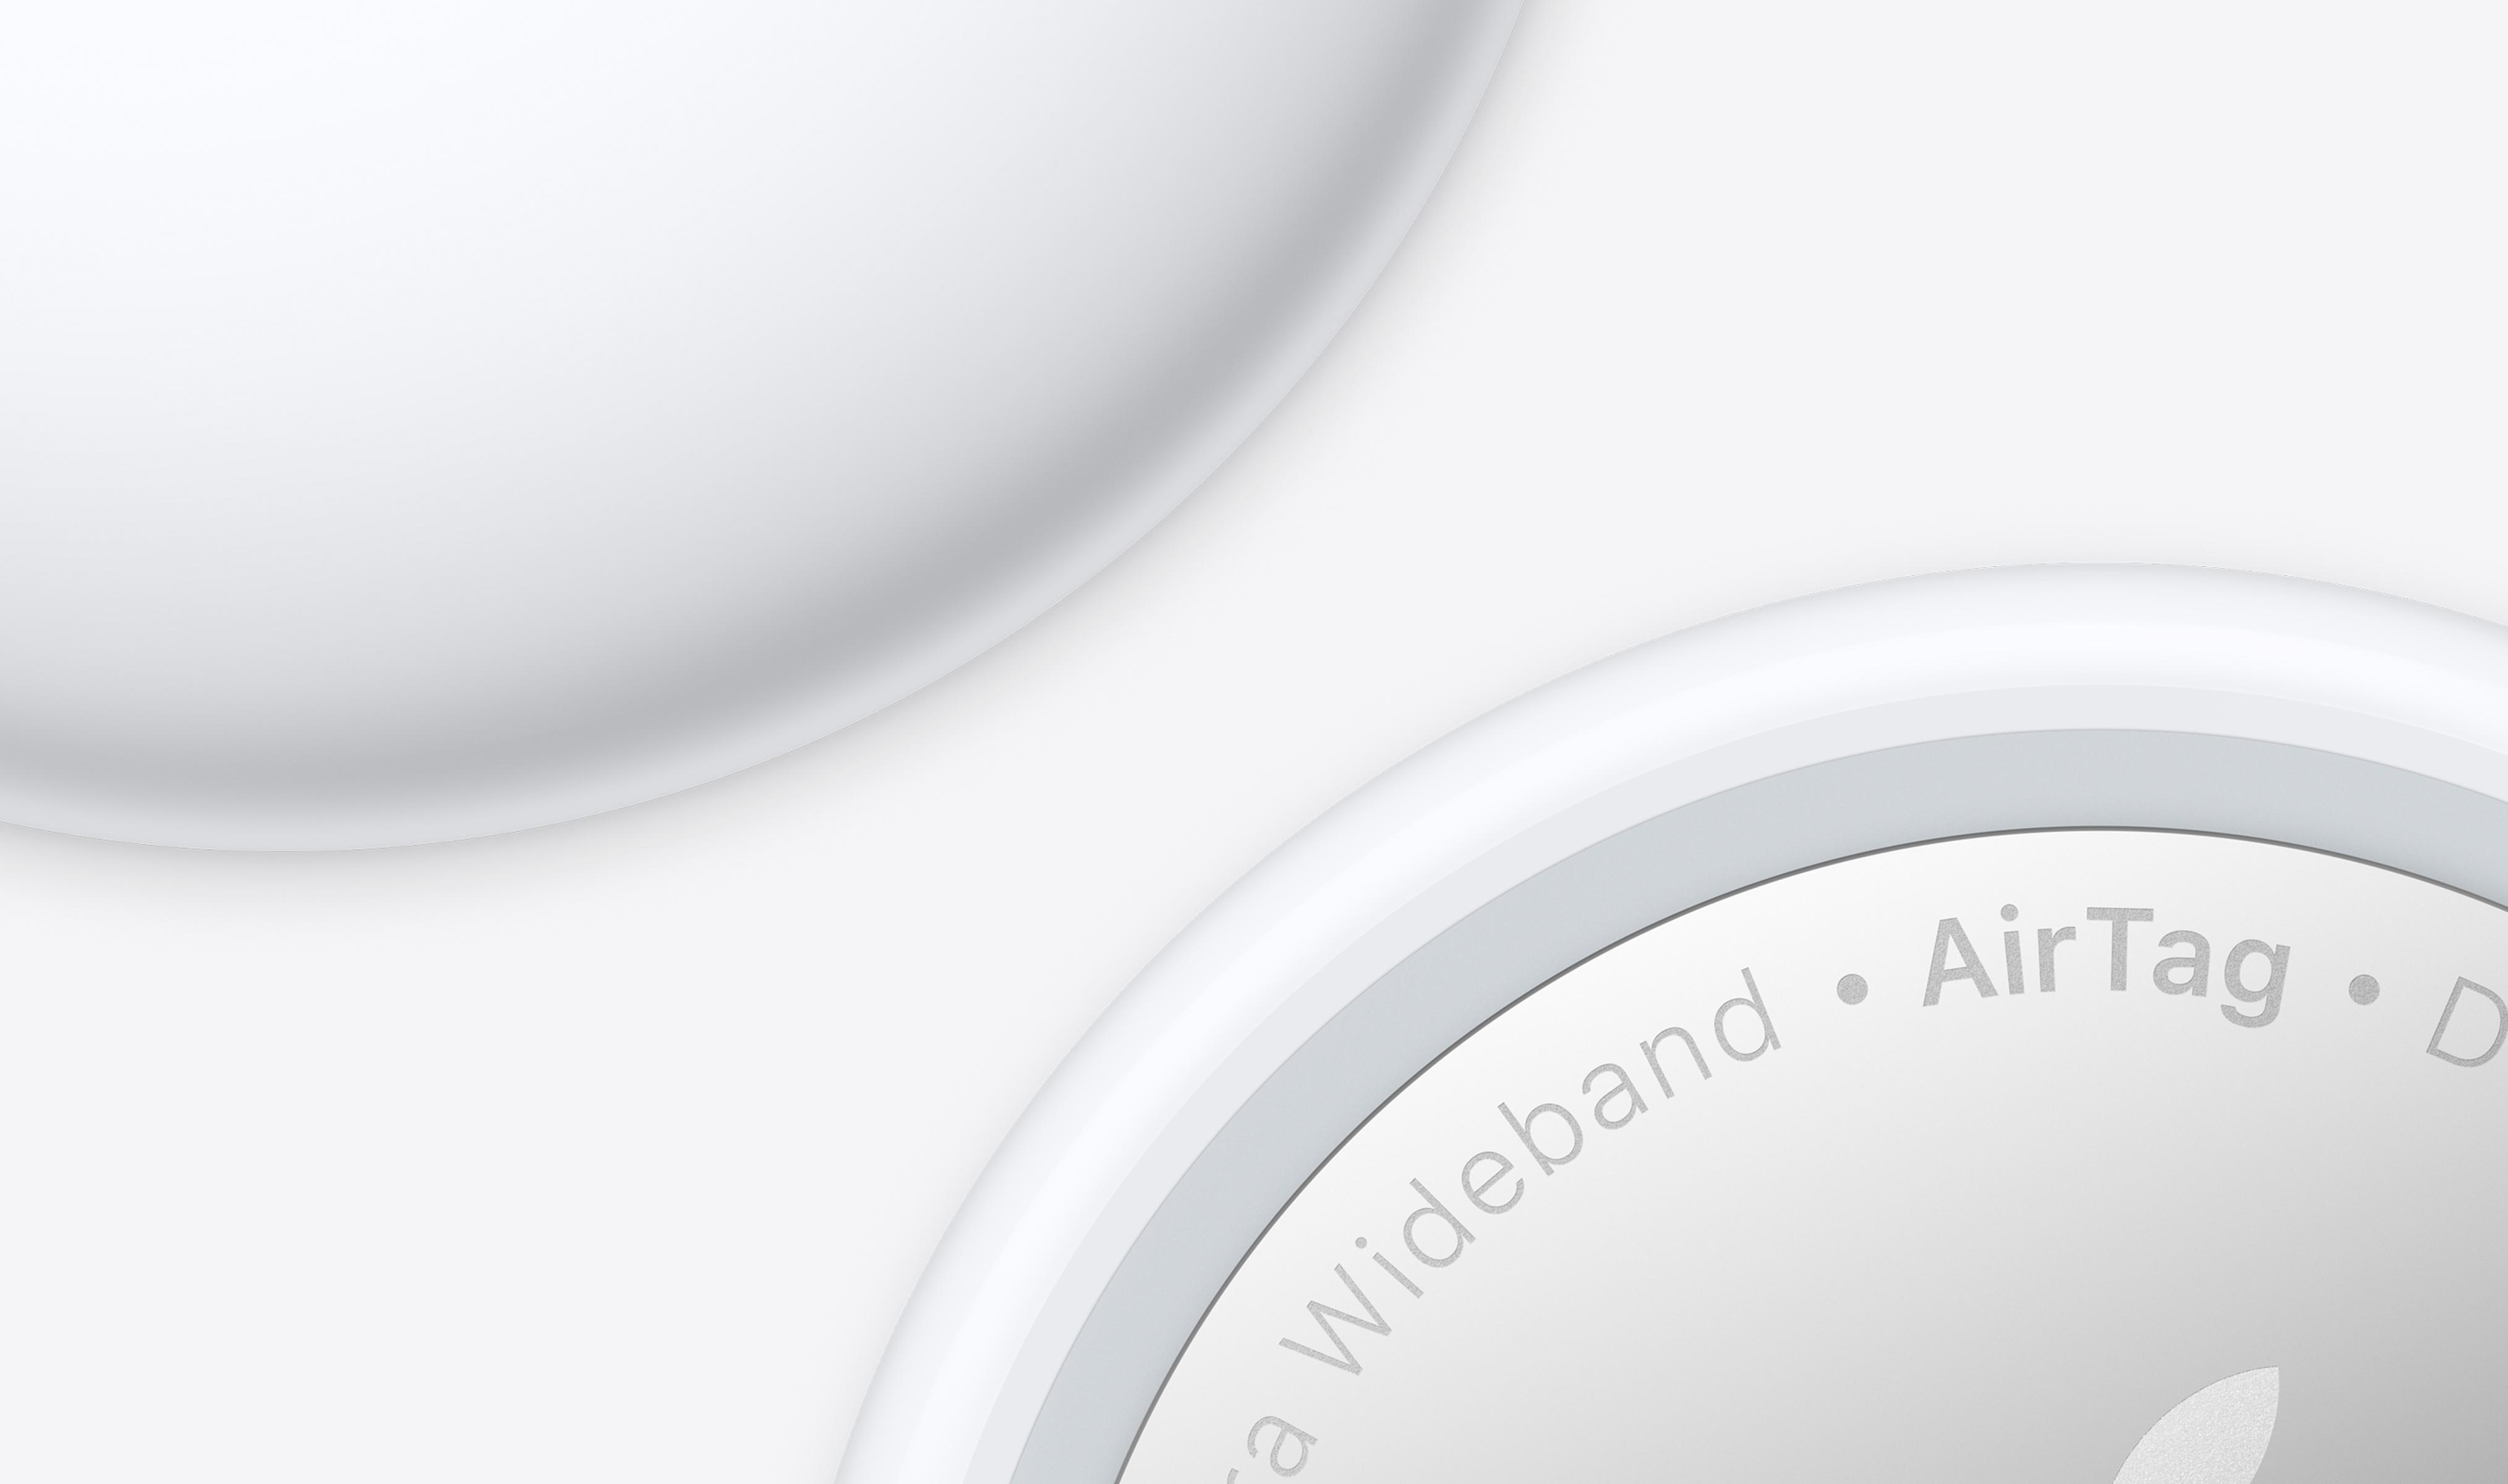 Buy Apple AirTag Best Price in Pakistan